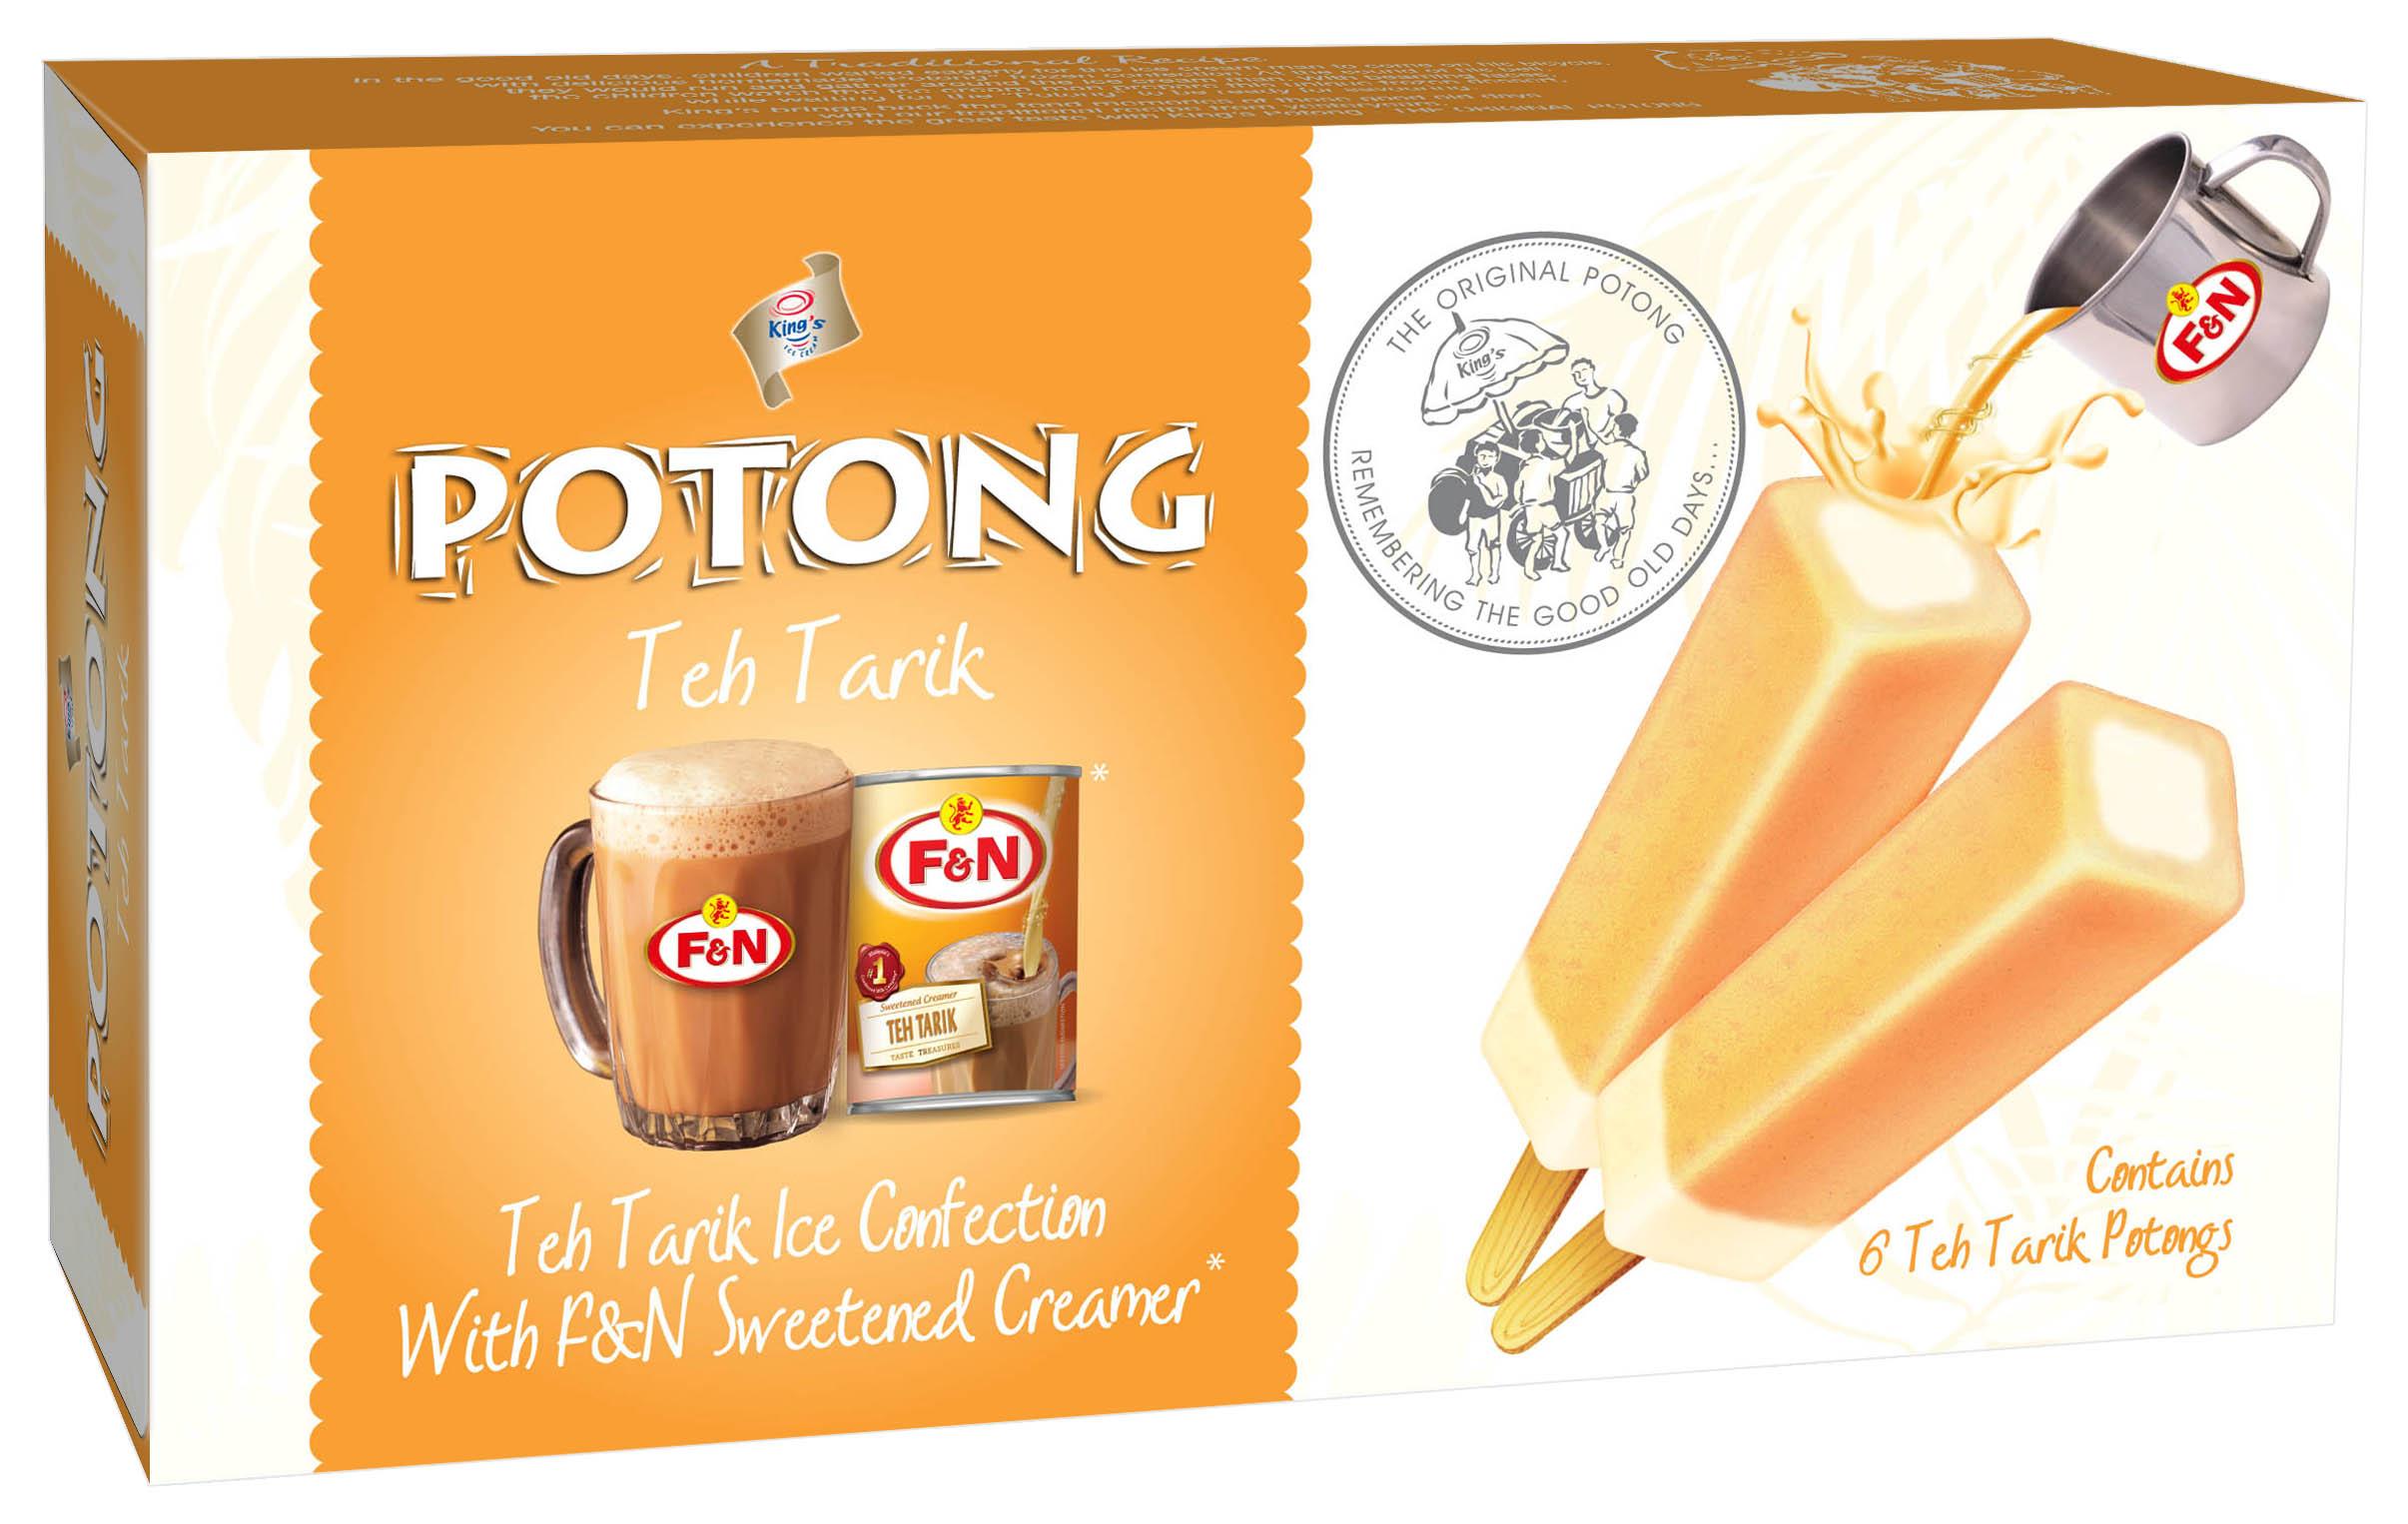 King's Potong Teh Tarik